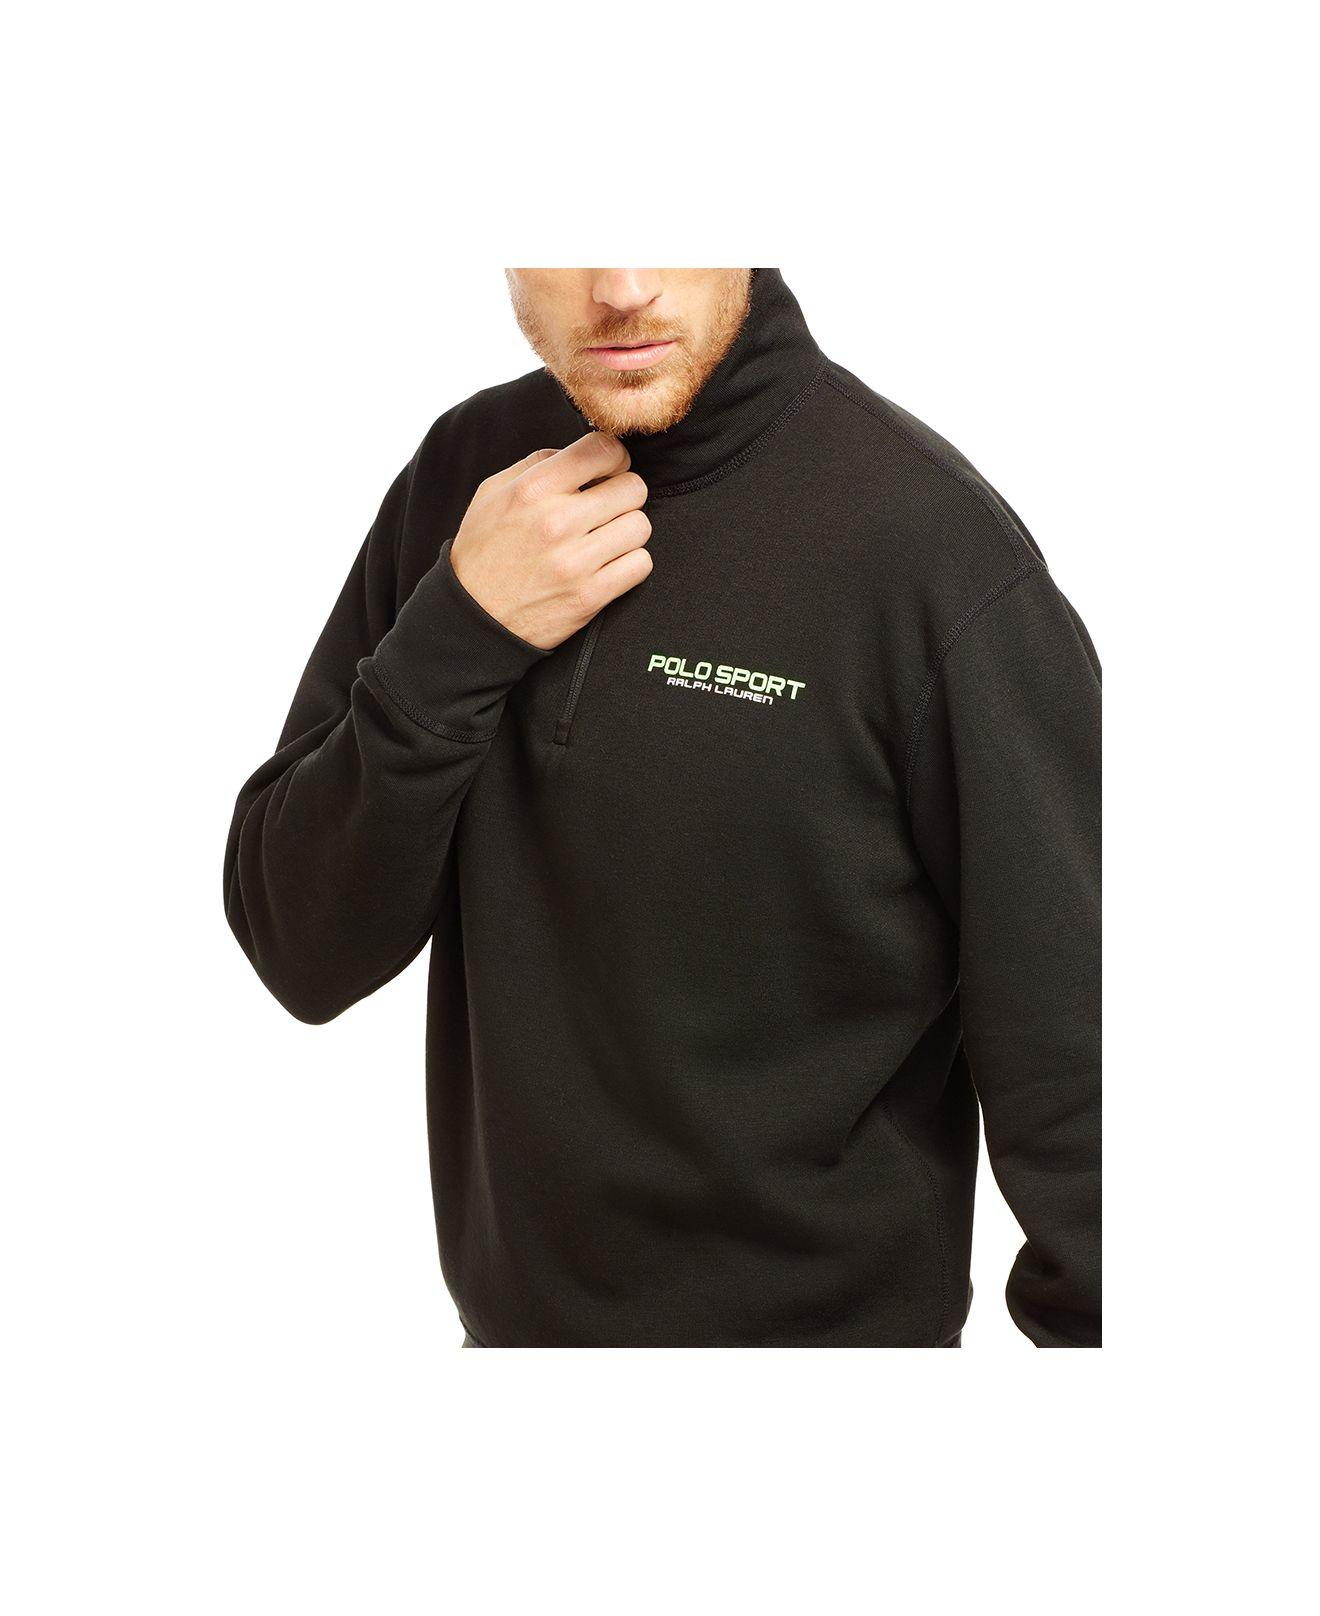 polo ralph lauren polo sport fleece half zip pullover in black for men polo black lyst. Black Bedroom Furniture Sets. Home Design Ideas